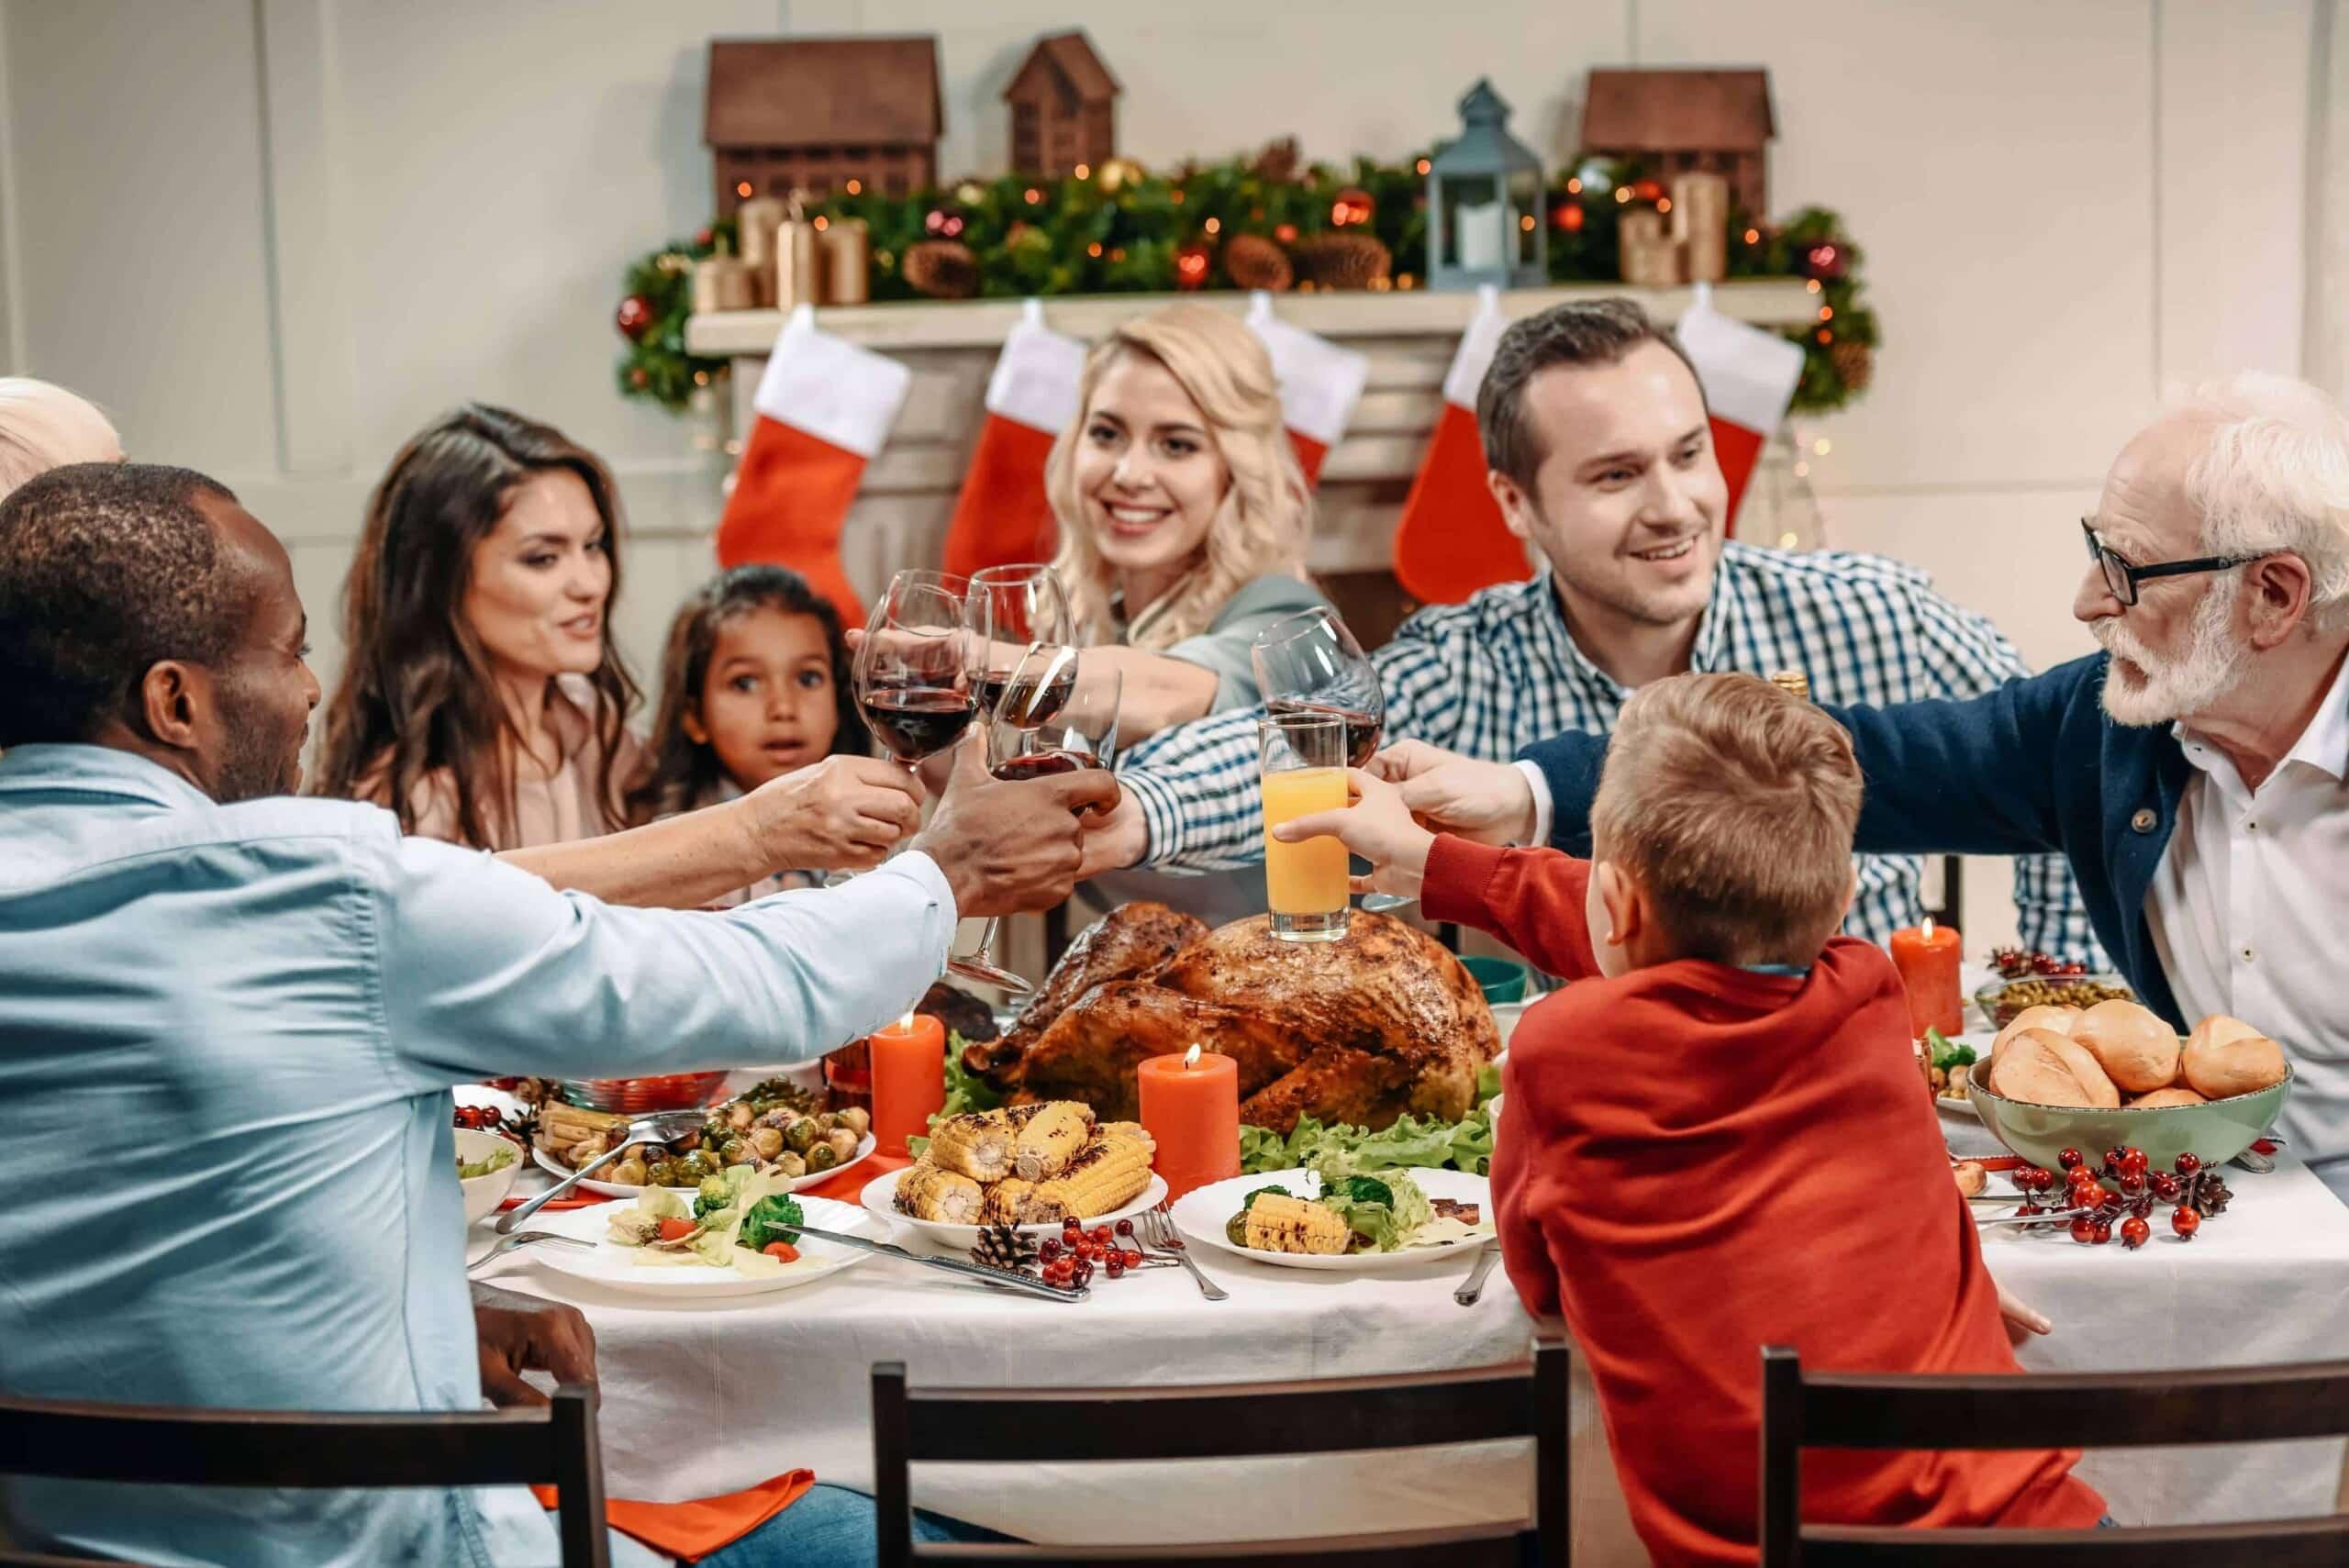 Family tension at Christmas